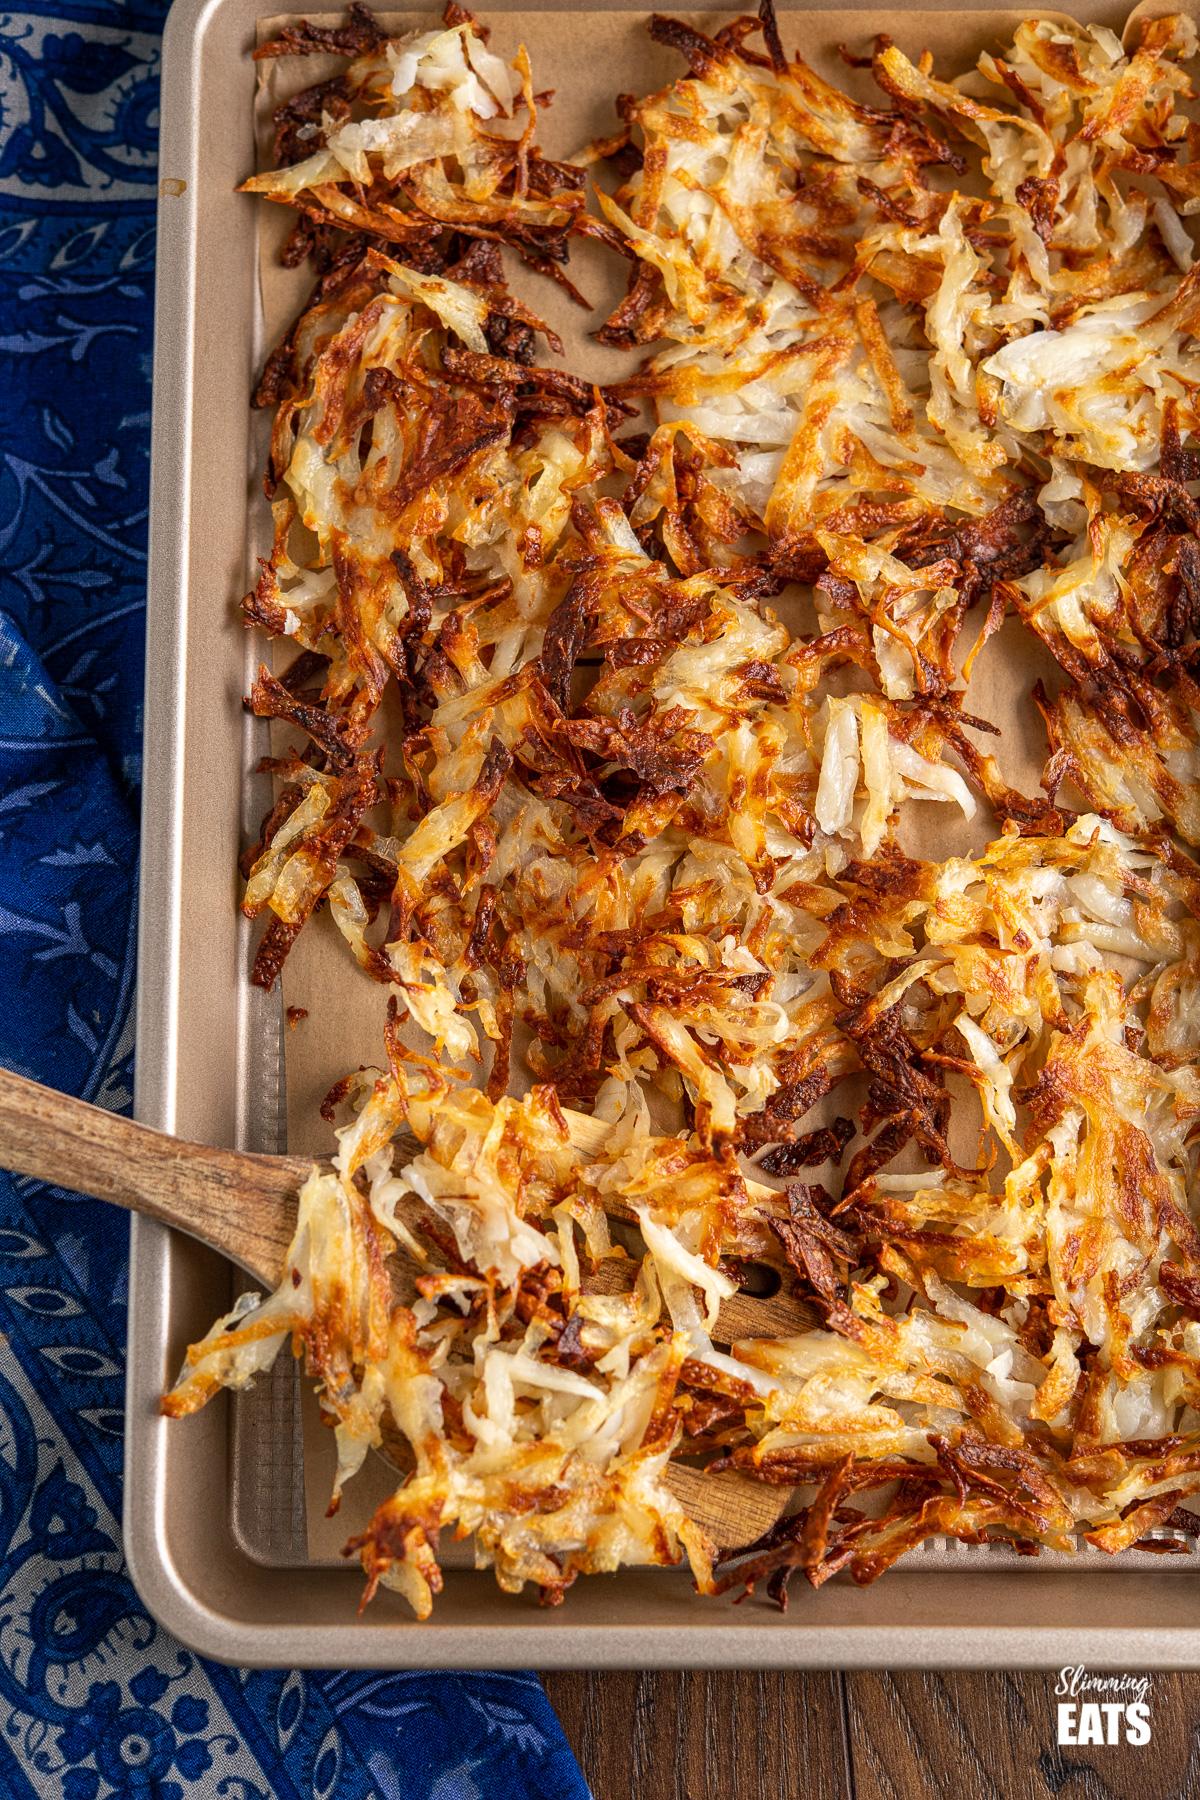 shredded potato hash browns on baking tray